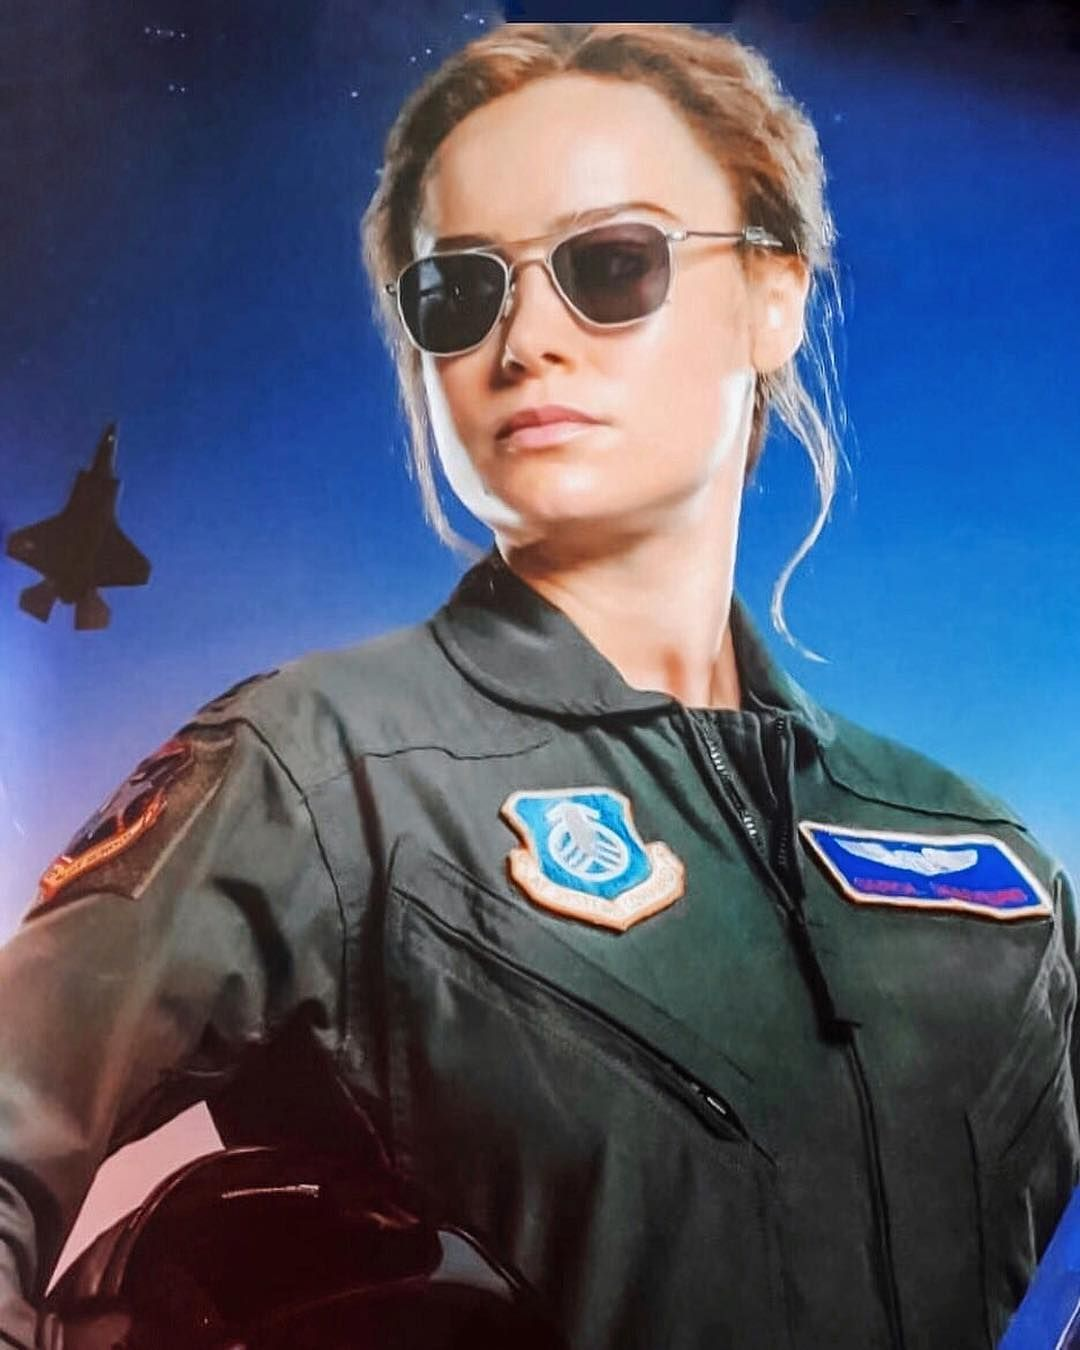 Brie Larson Captain Marvel On Instagram New Captain Marvel Promo Art Shows Brielarson S Carol Danvers In Fig Captain Marvel Costume Captain Marvel Marvel A cool, exciting recruitment tool. brie larson captain marvel on